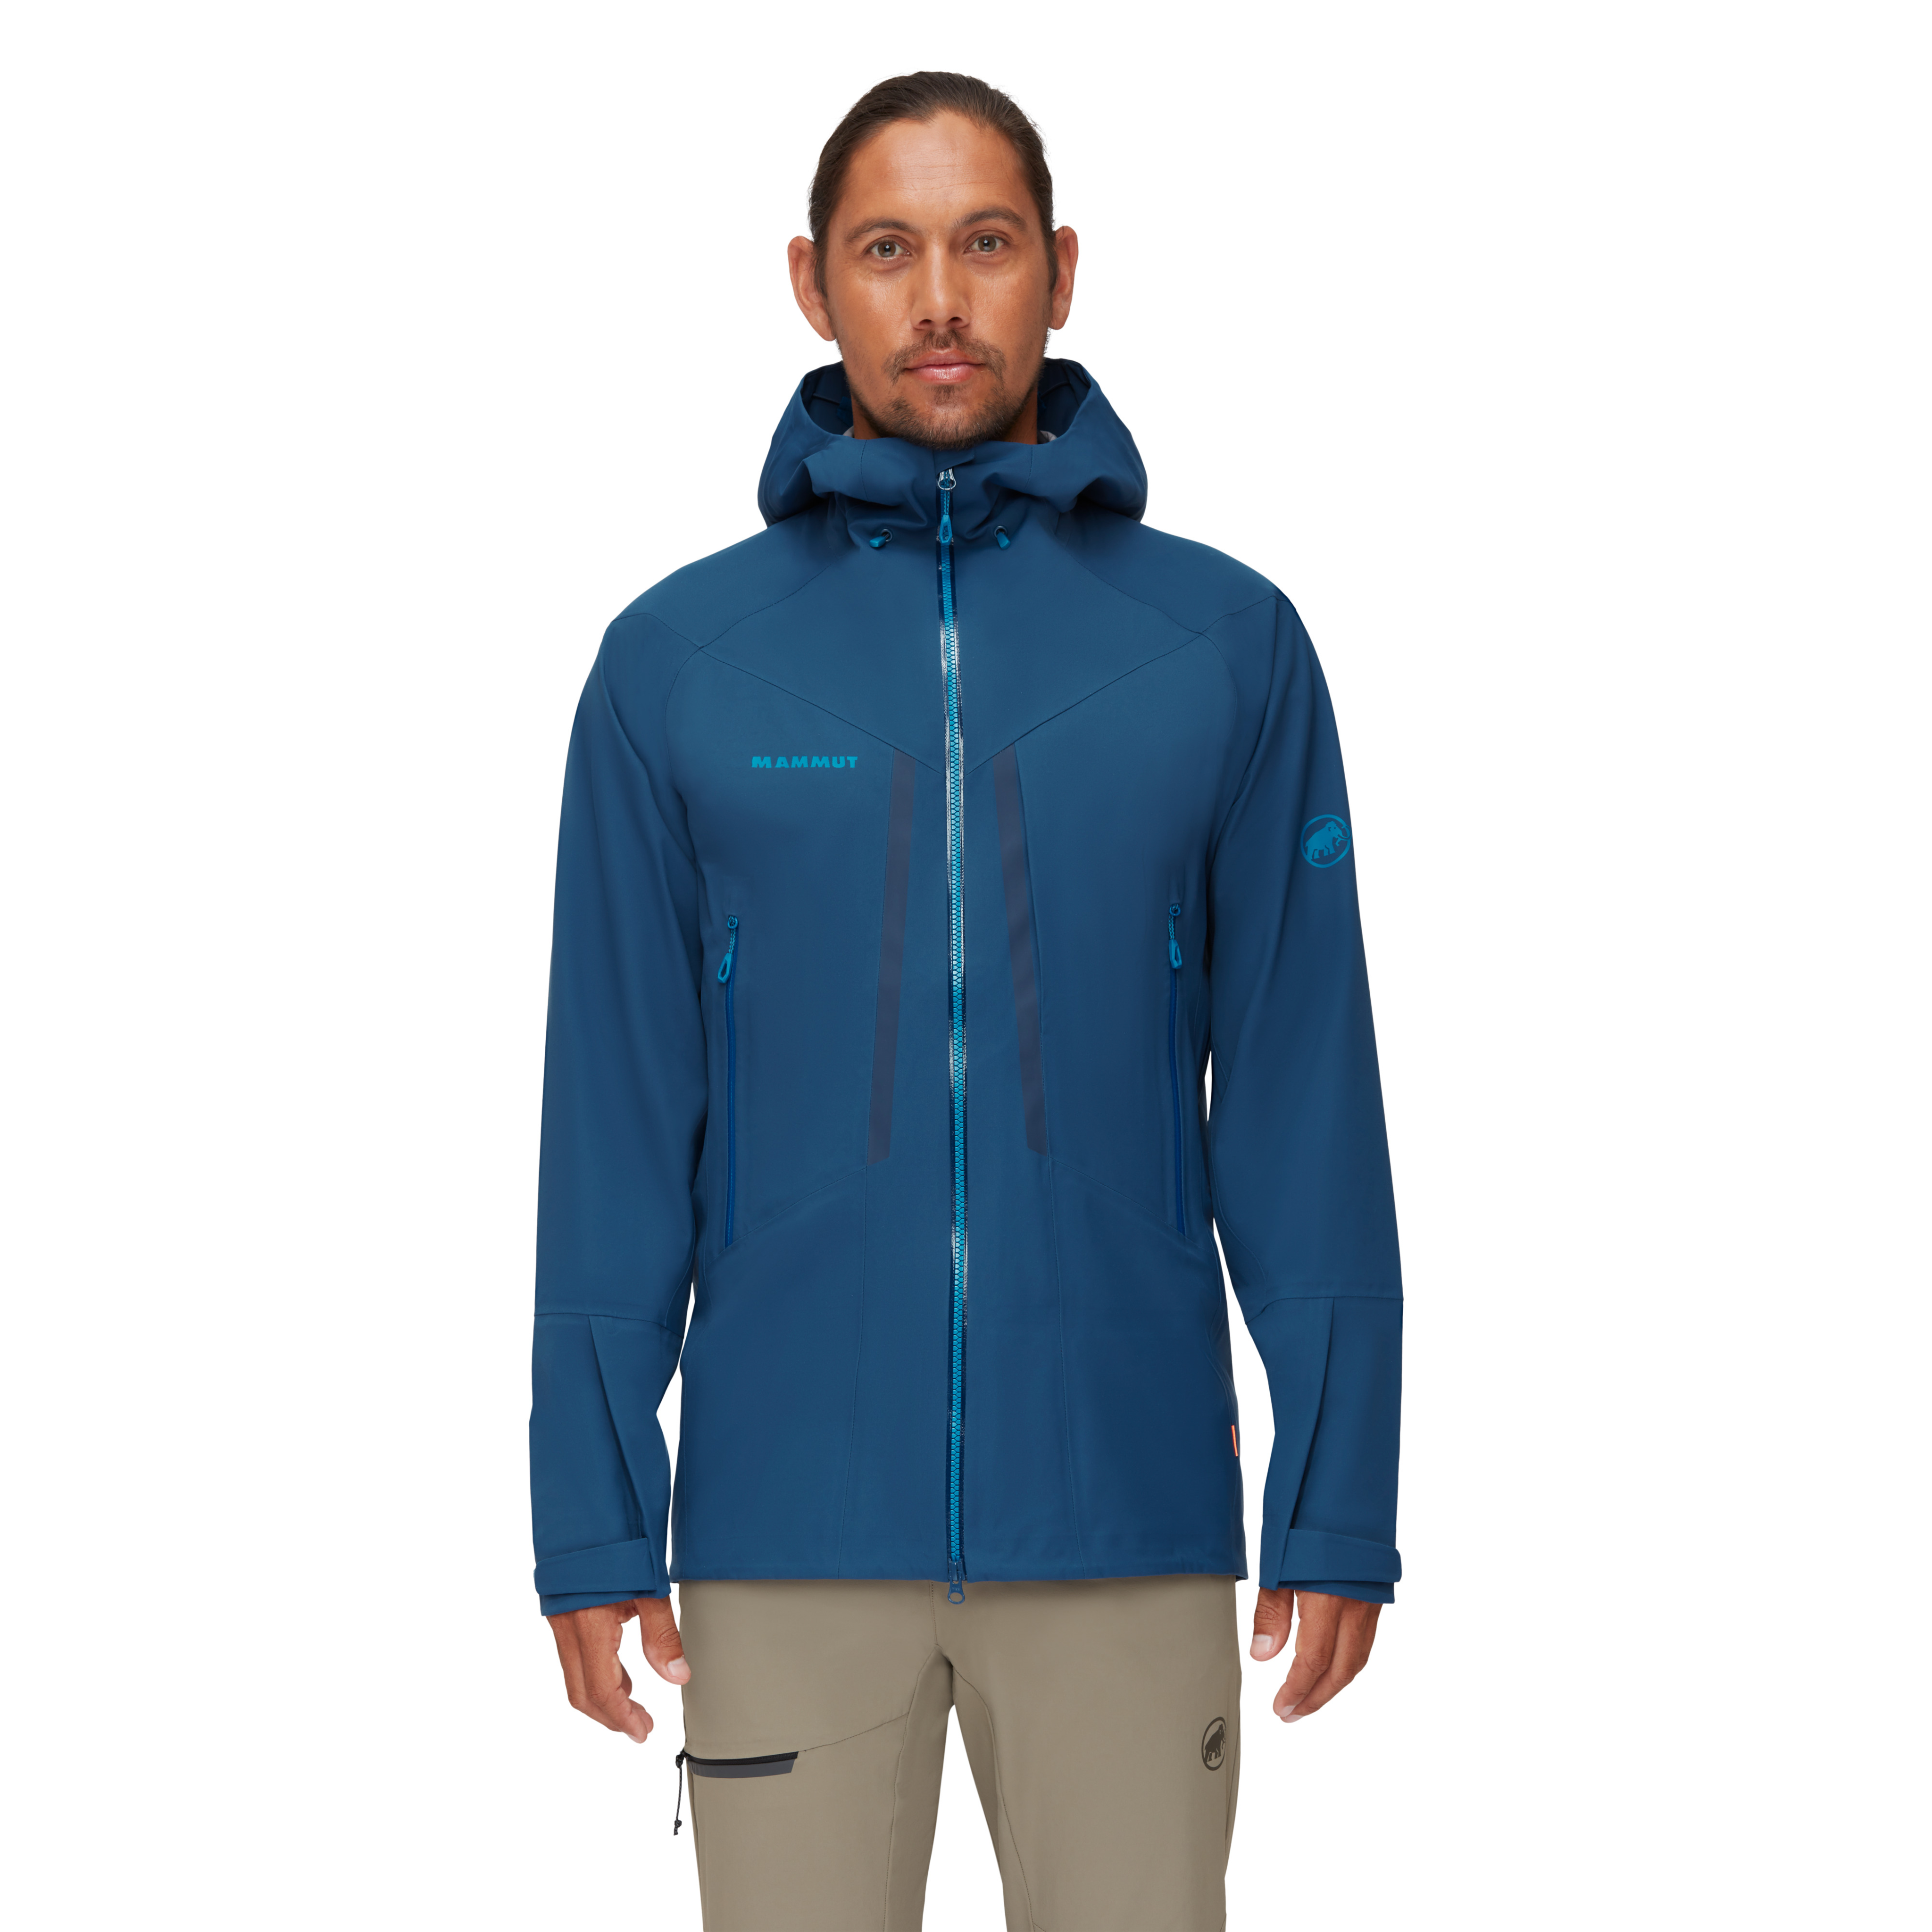 Masao HS Hooded Jacket Men product image